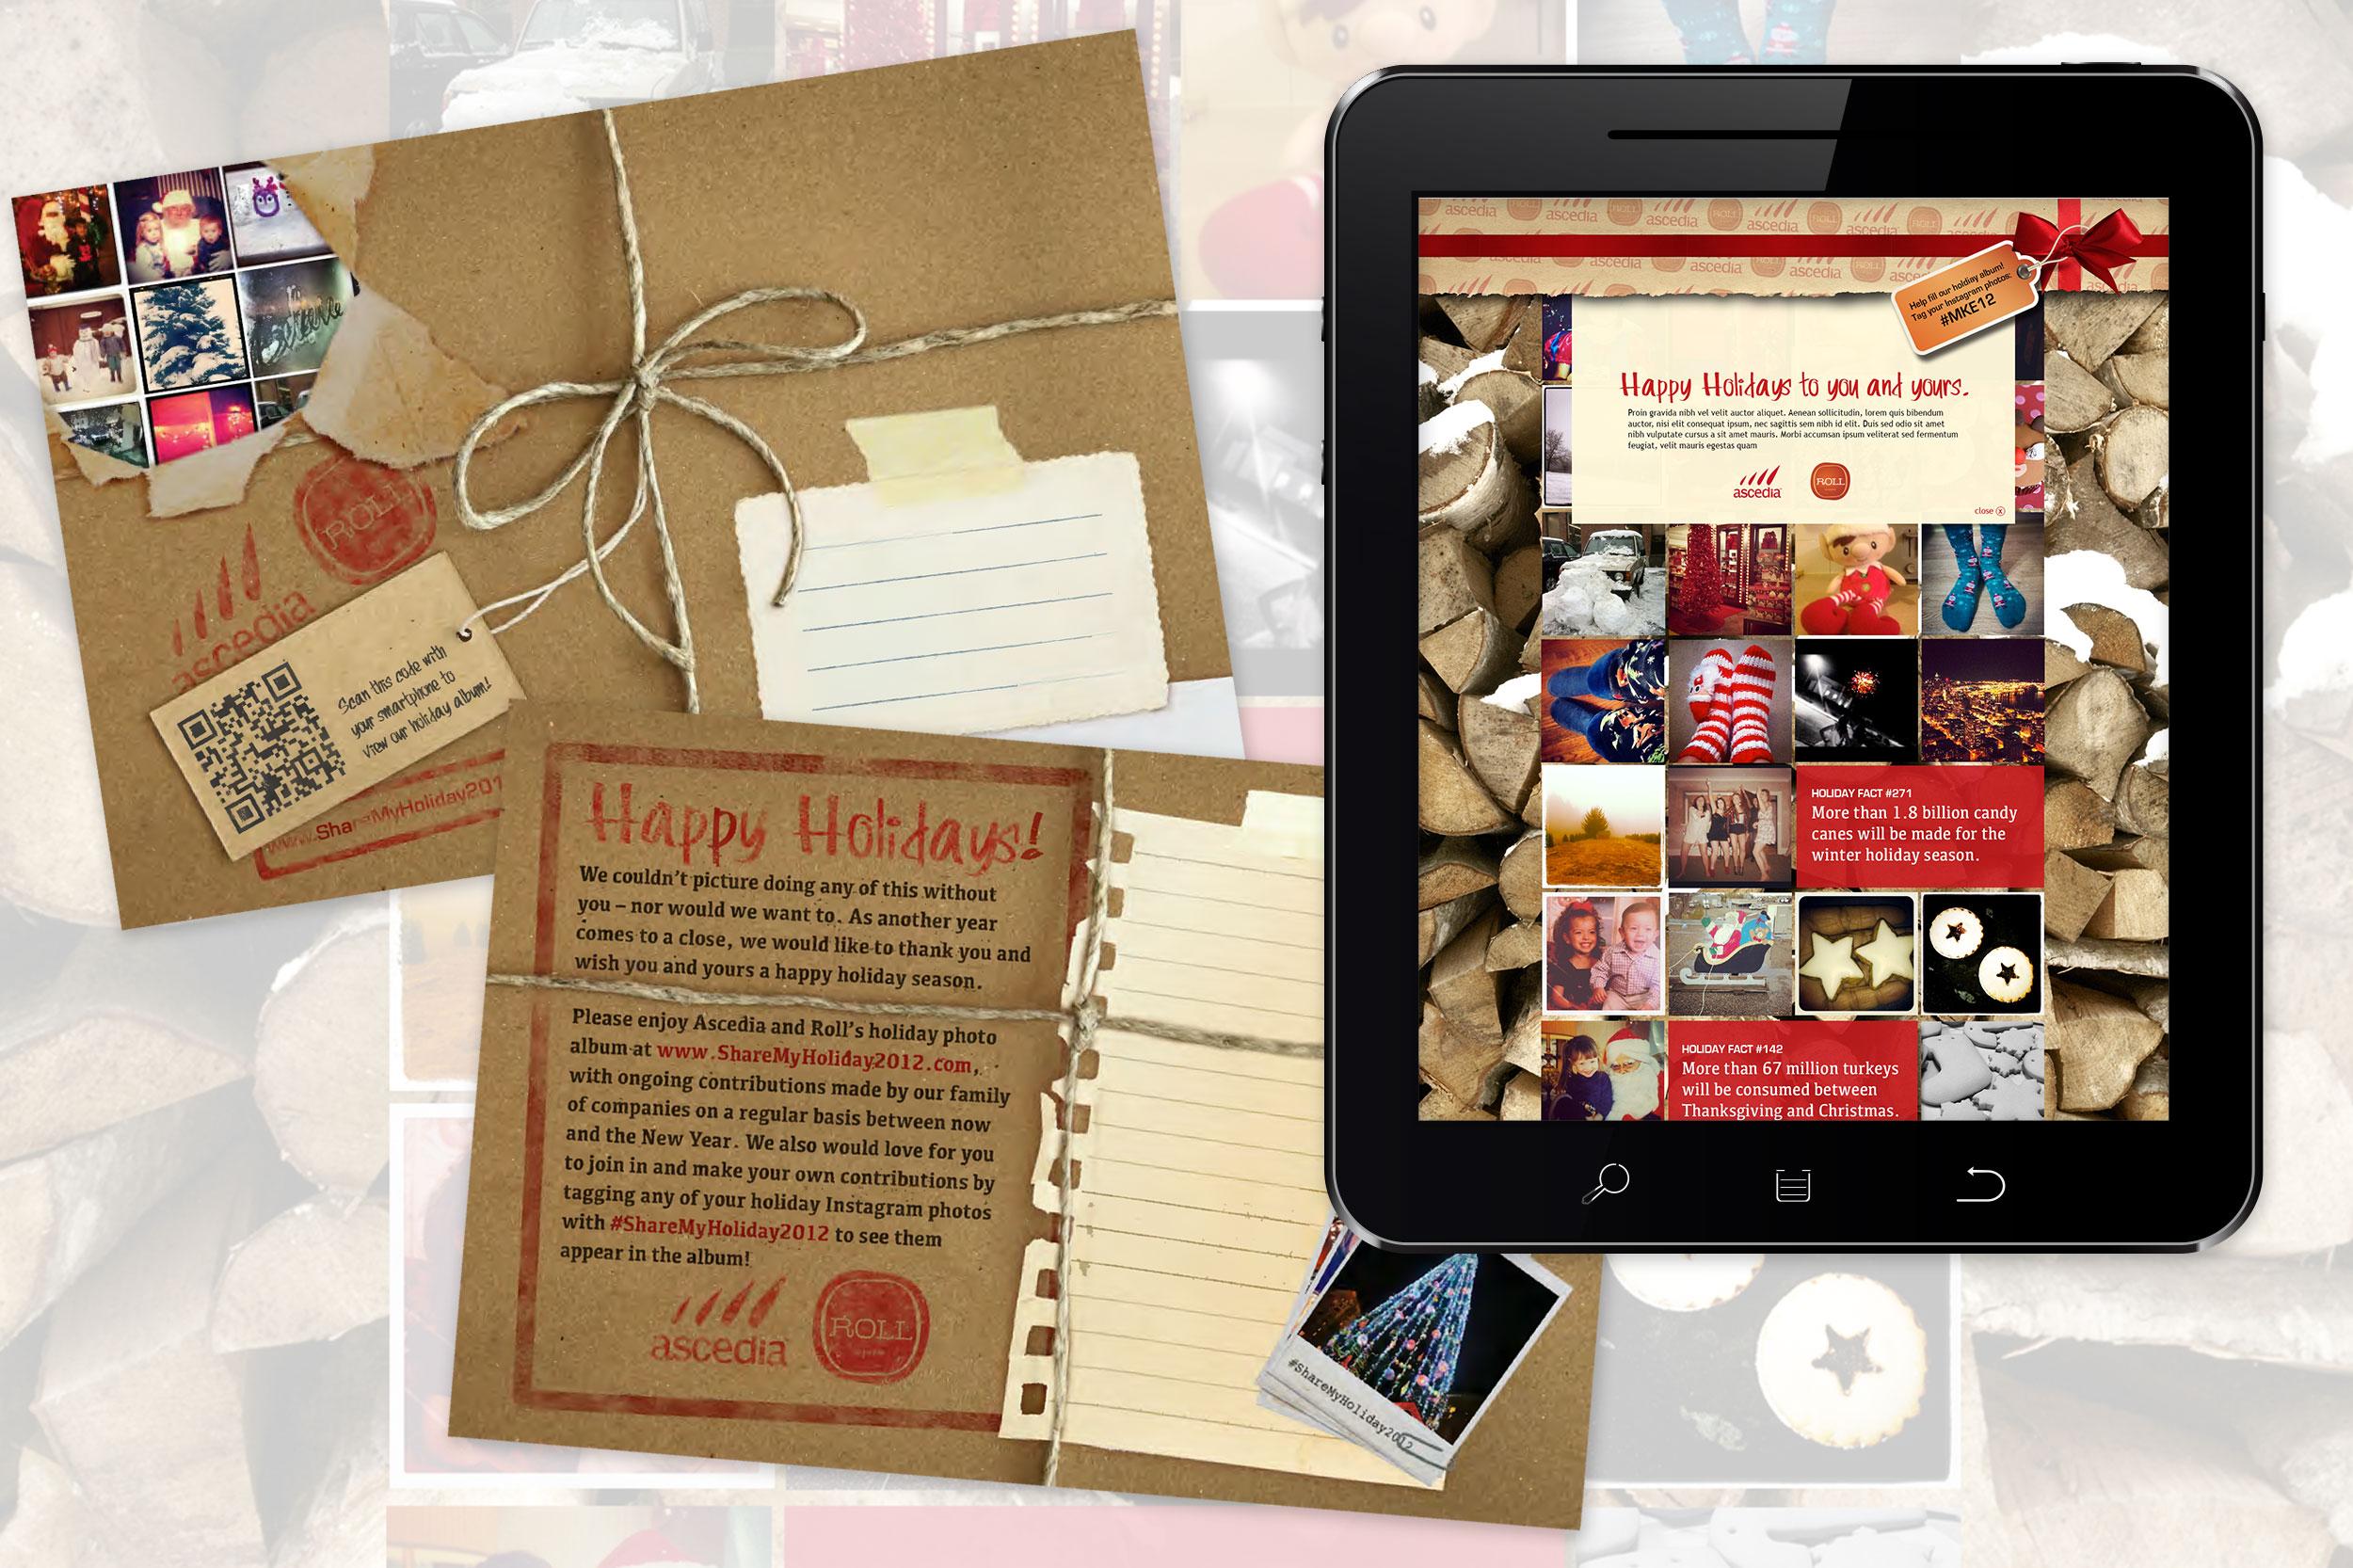 Ascedia Holiday Postcard and Microsite (2012)